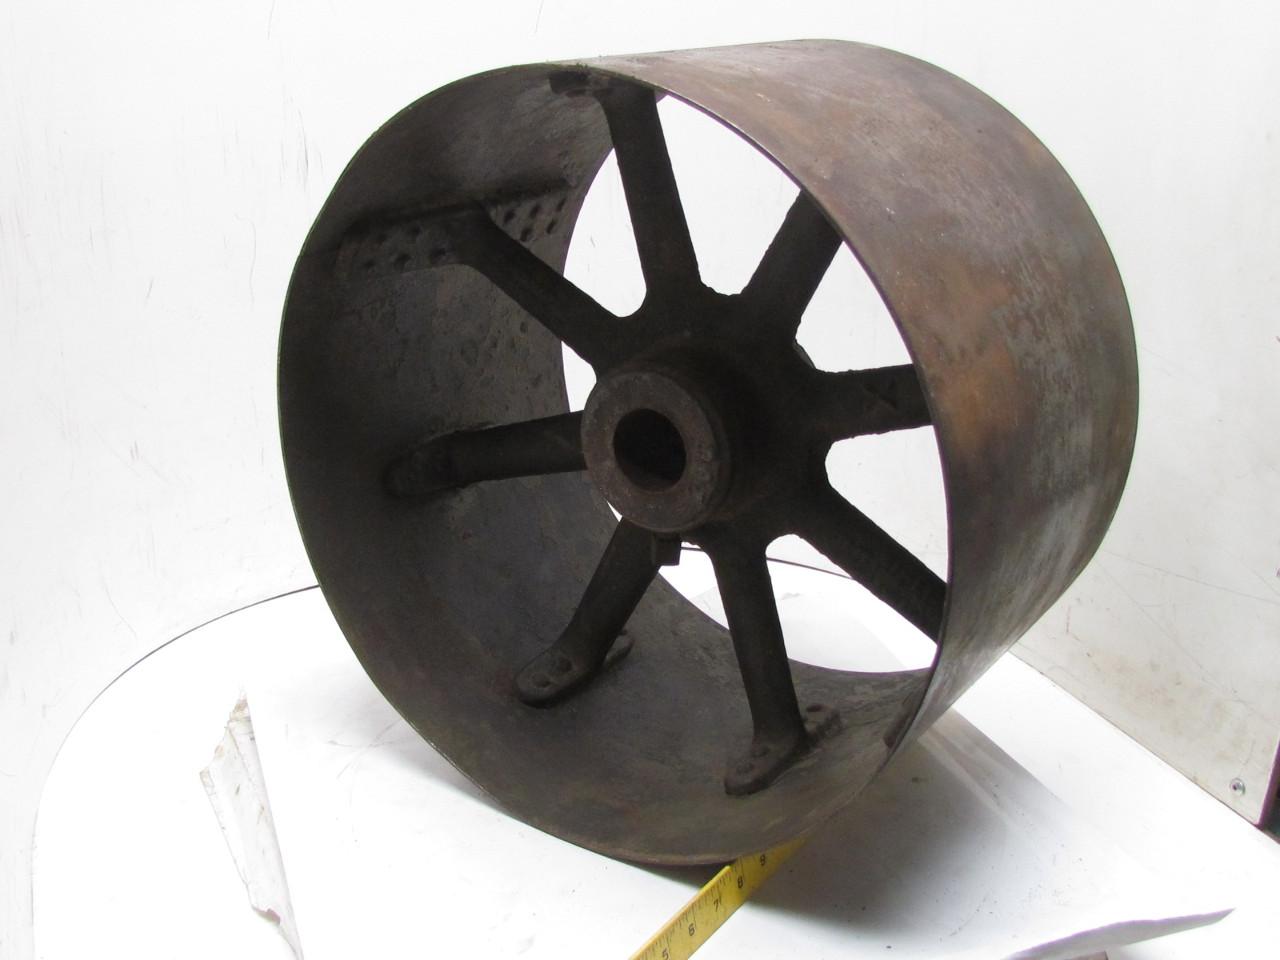 Vintage steampunk spoked cast iron riveted flat belt